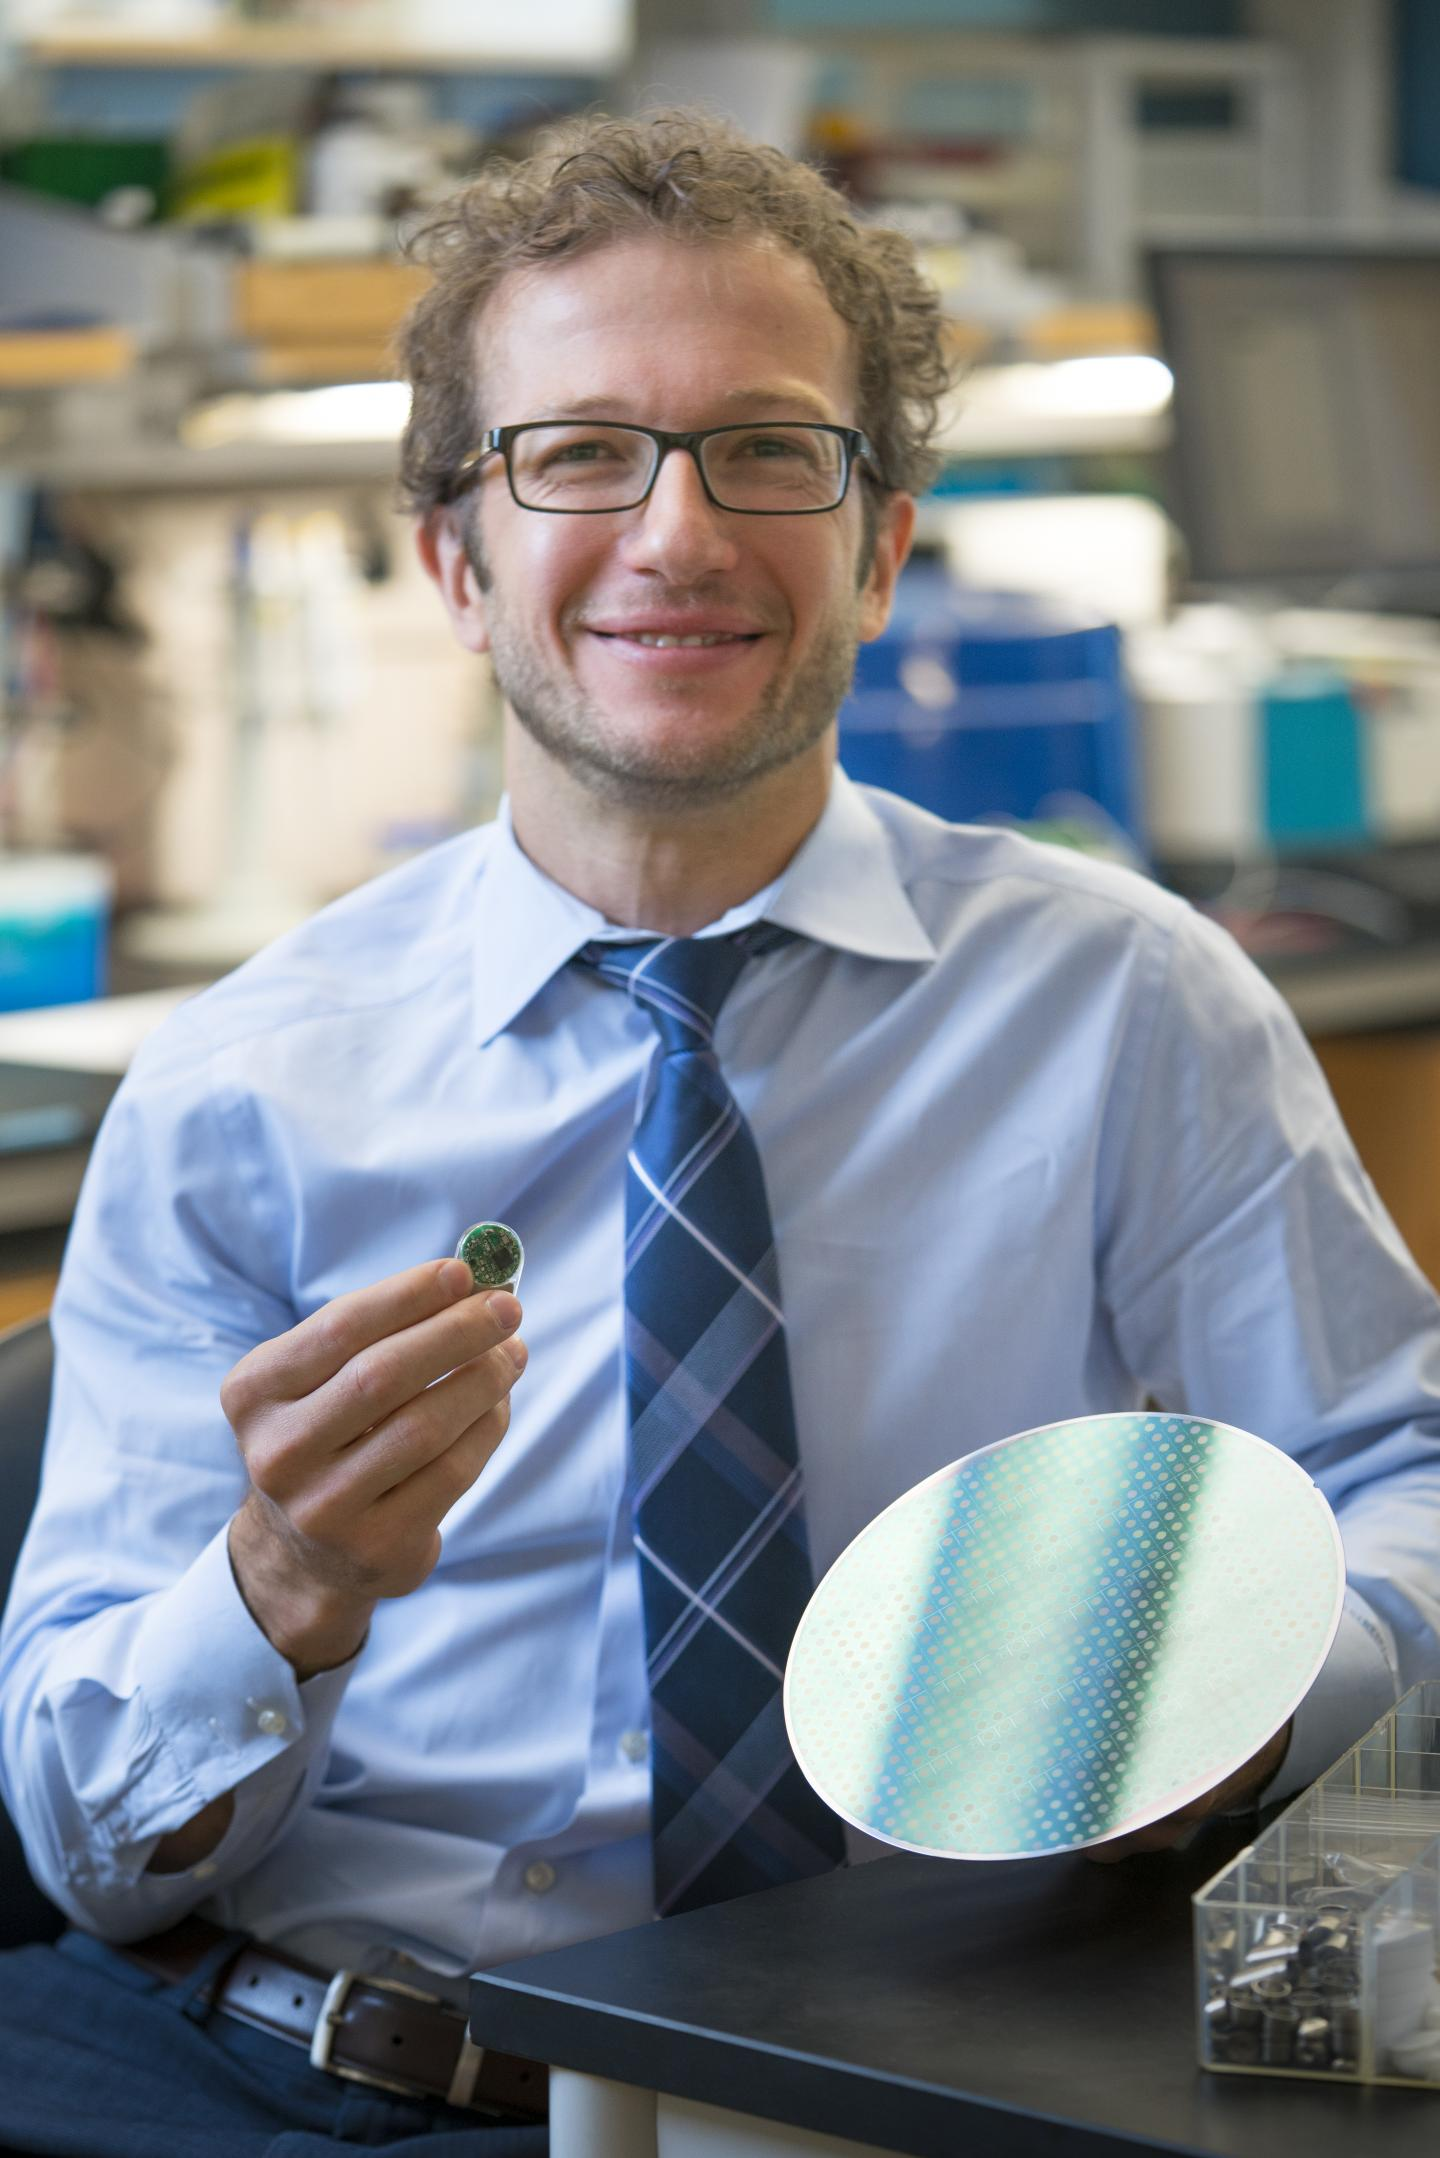 Alessandro Grattoni, Ph.D., Houston Methodist Research Institute